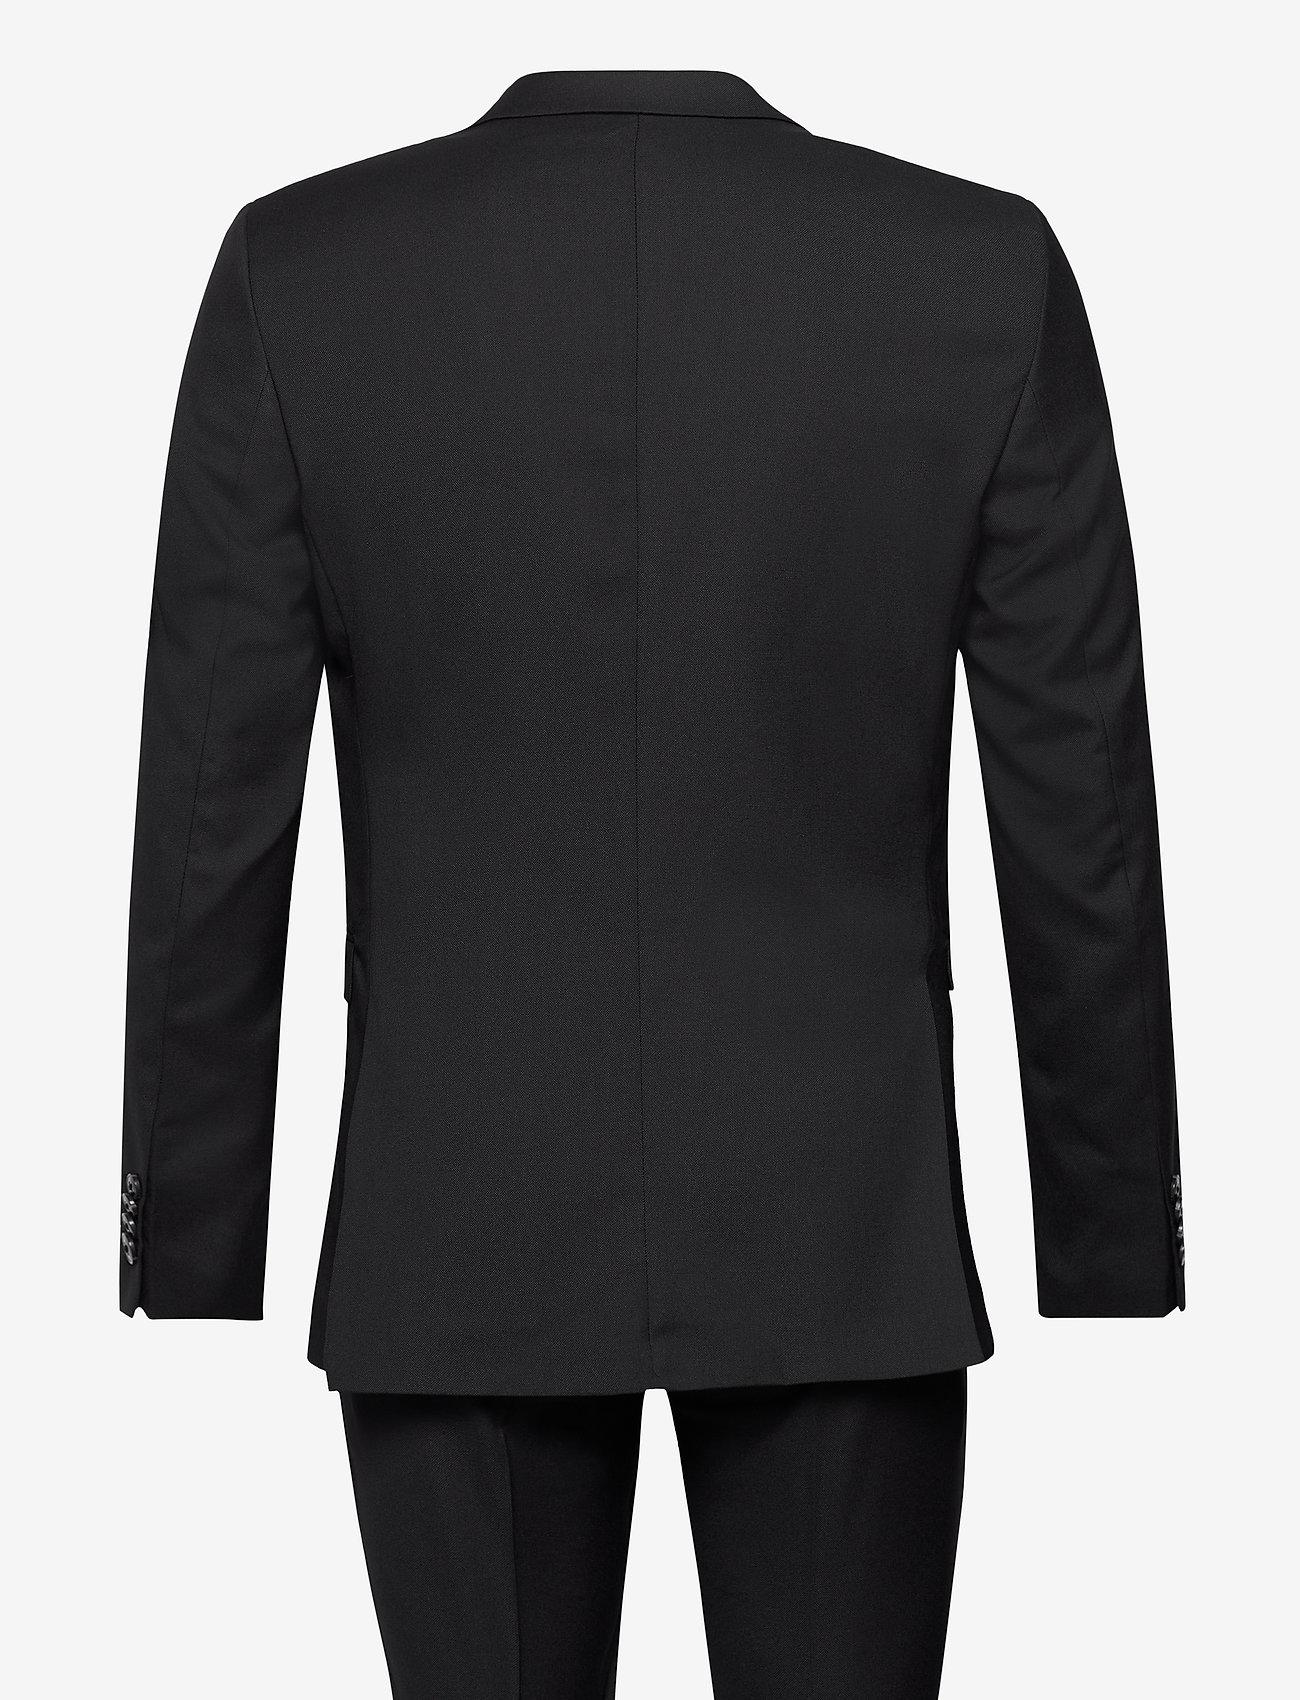 Jack & Jones - JPRSOLARIS SUIT - costumes - black - 1